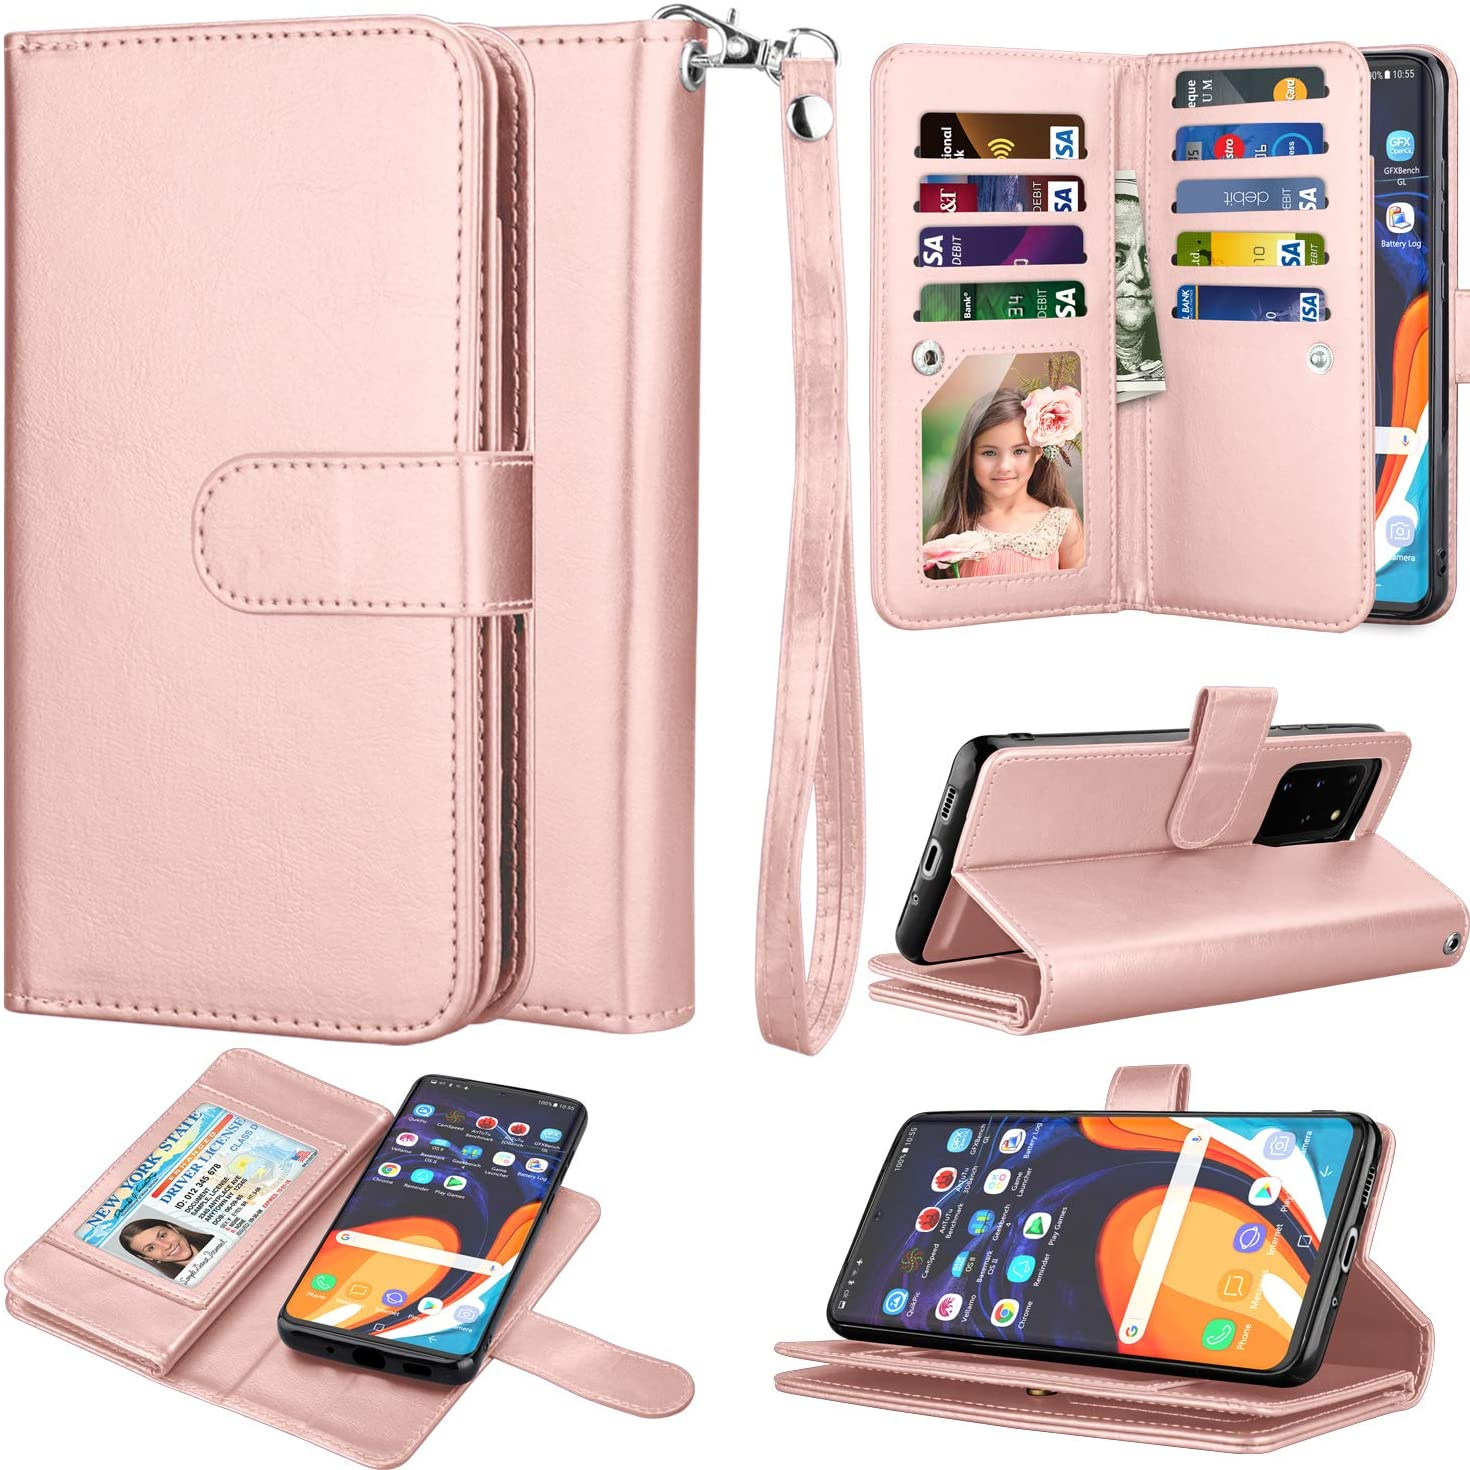 Takfox Galaxy S20 Case, Galaxy S20 Wallet Phone Case 6.2